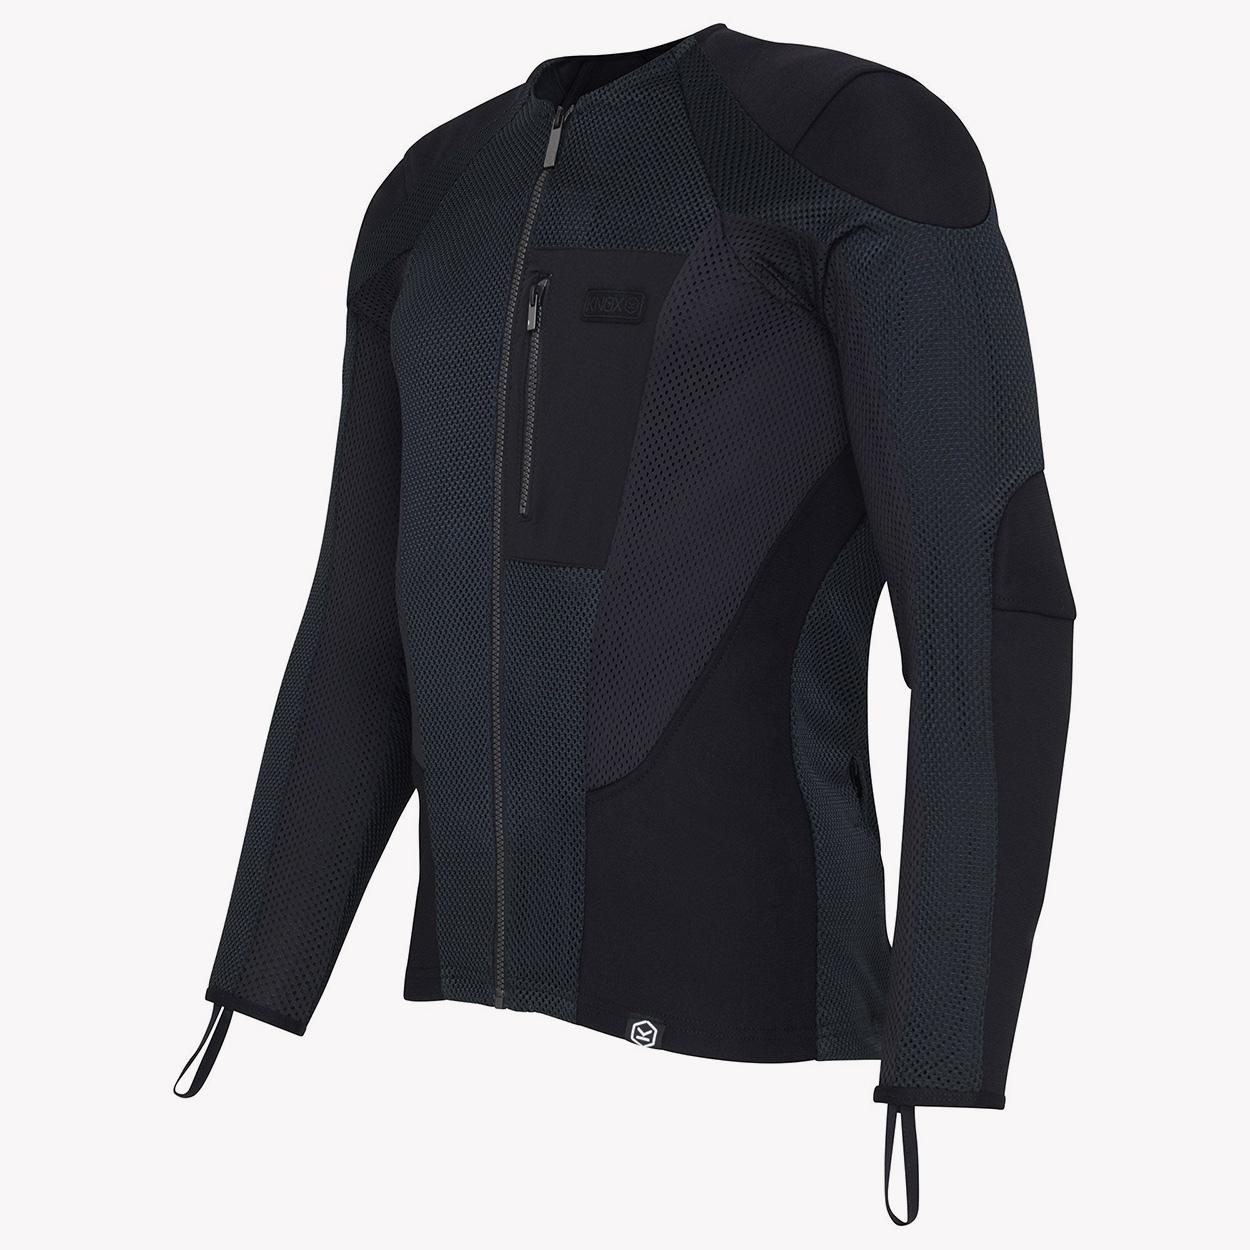 Knox Urbane Pro armored shirt